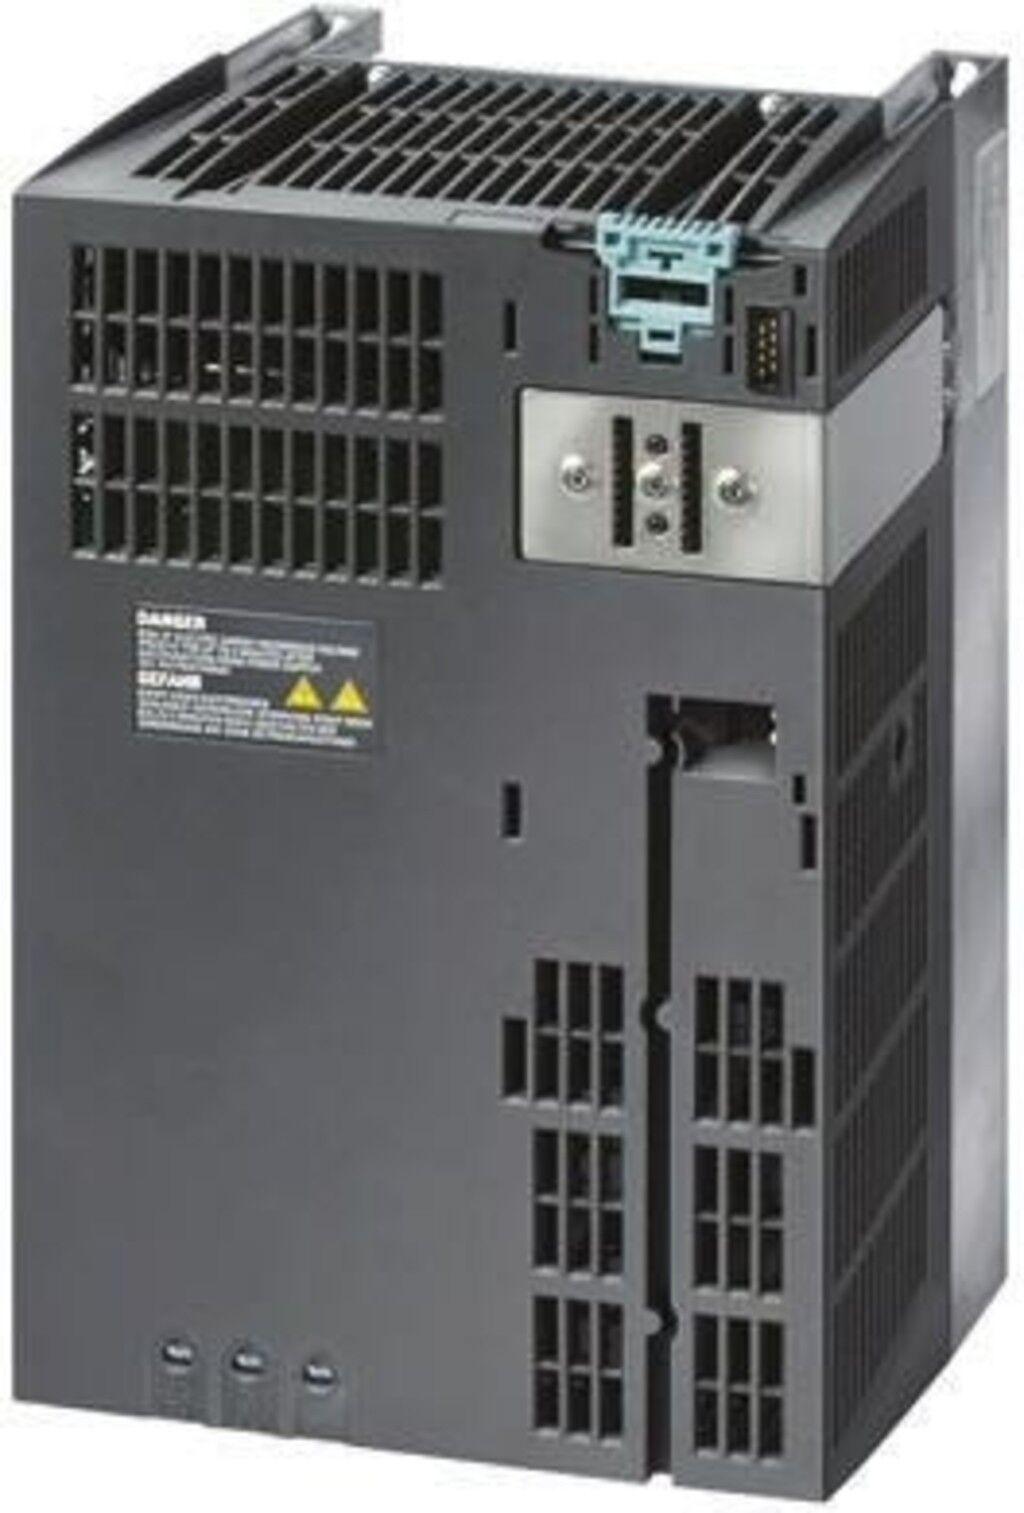 6SL3224-0BE34-5UA0  SIEMENS  G120 PM240  45KW//55KW.UNFILTER NEW IN BOX